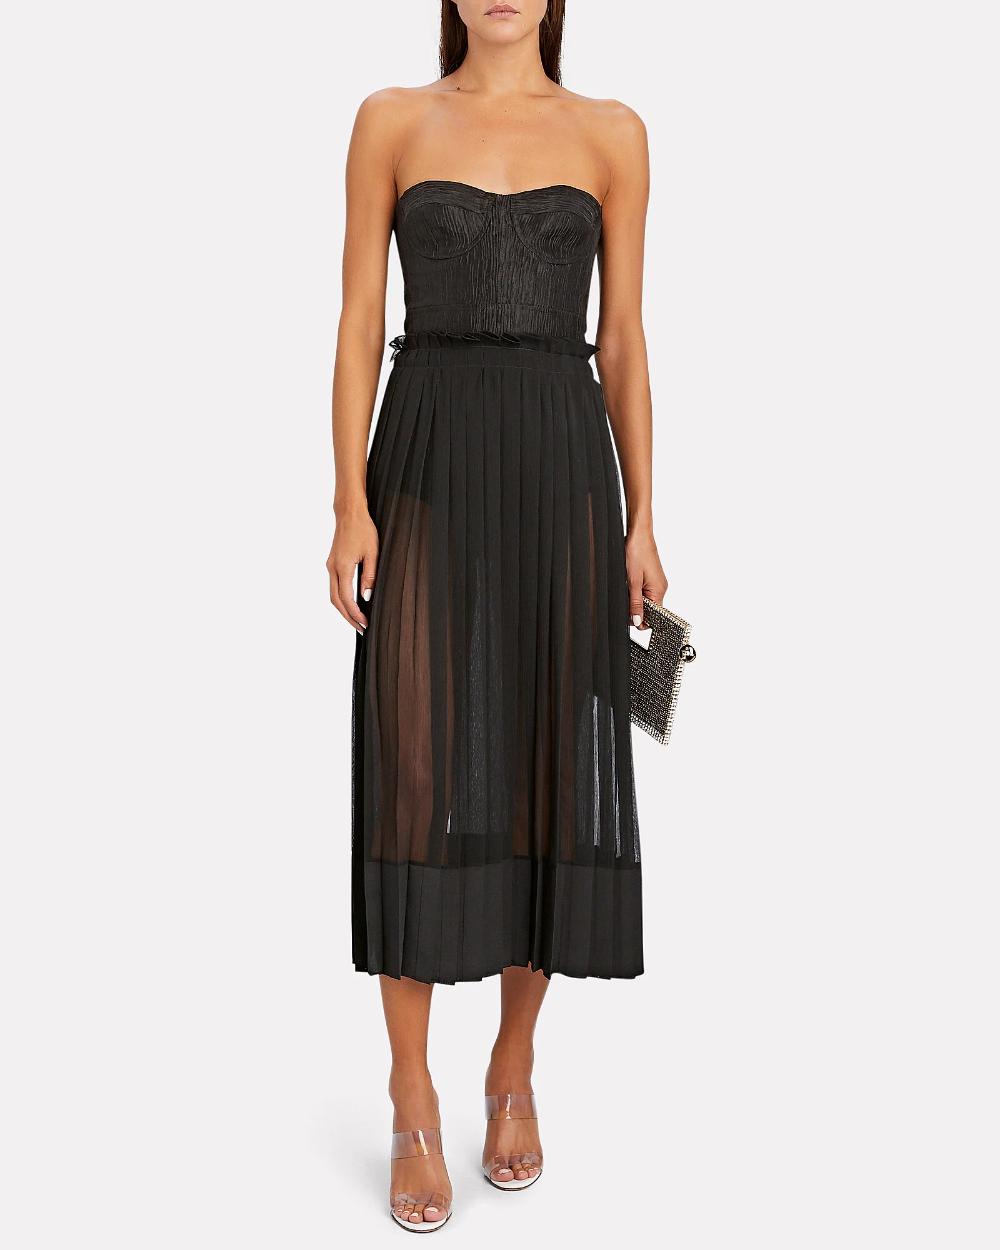 Inasia Strapless Midi Dress Strapless Midi Dress Dresses Select Dress [ 1250 x 1000 Pixel ]